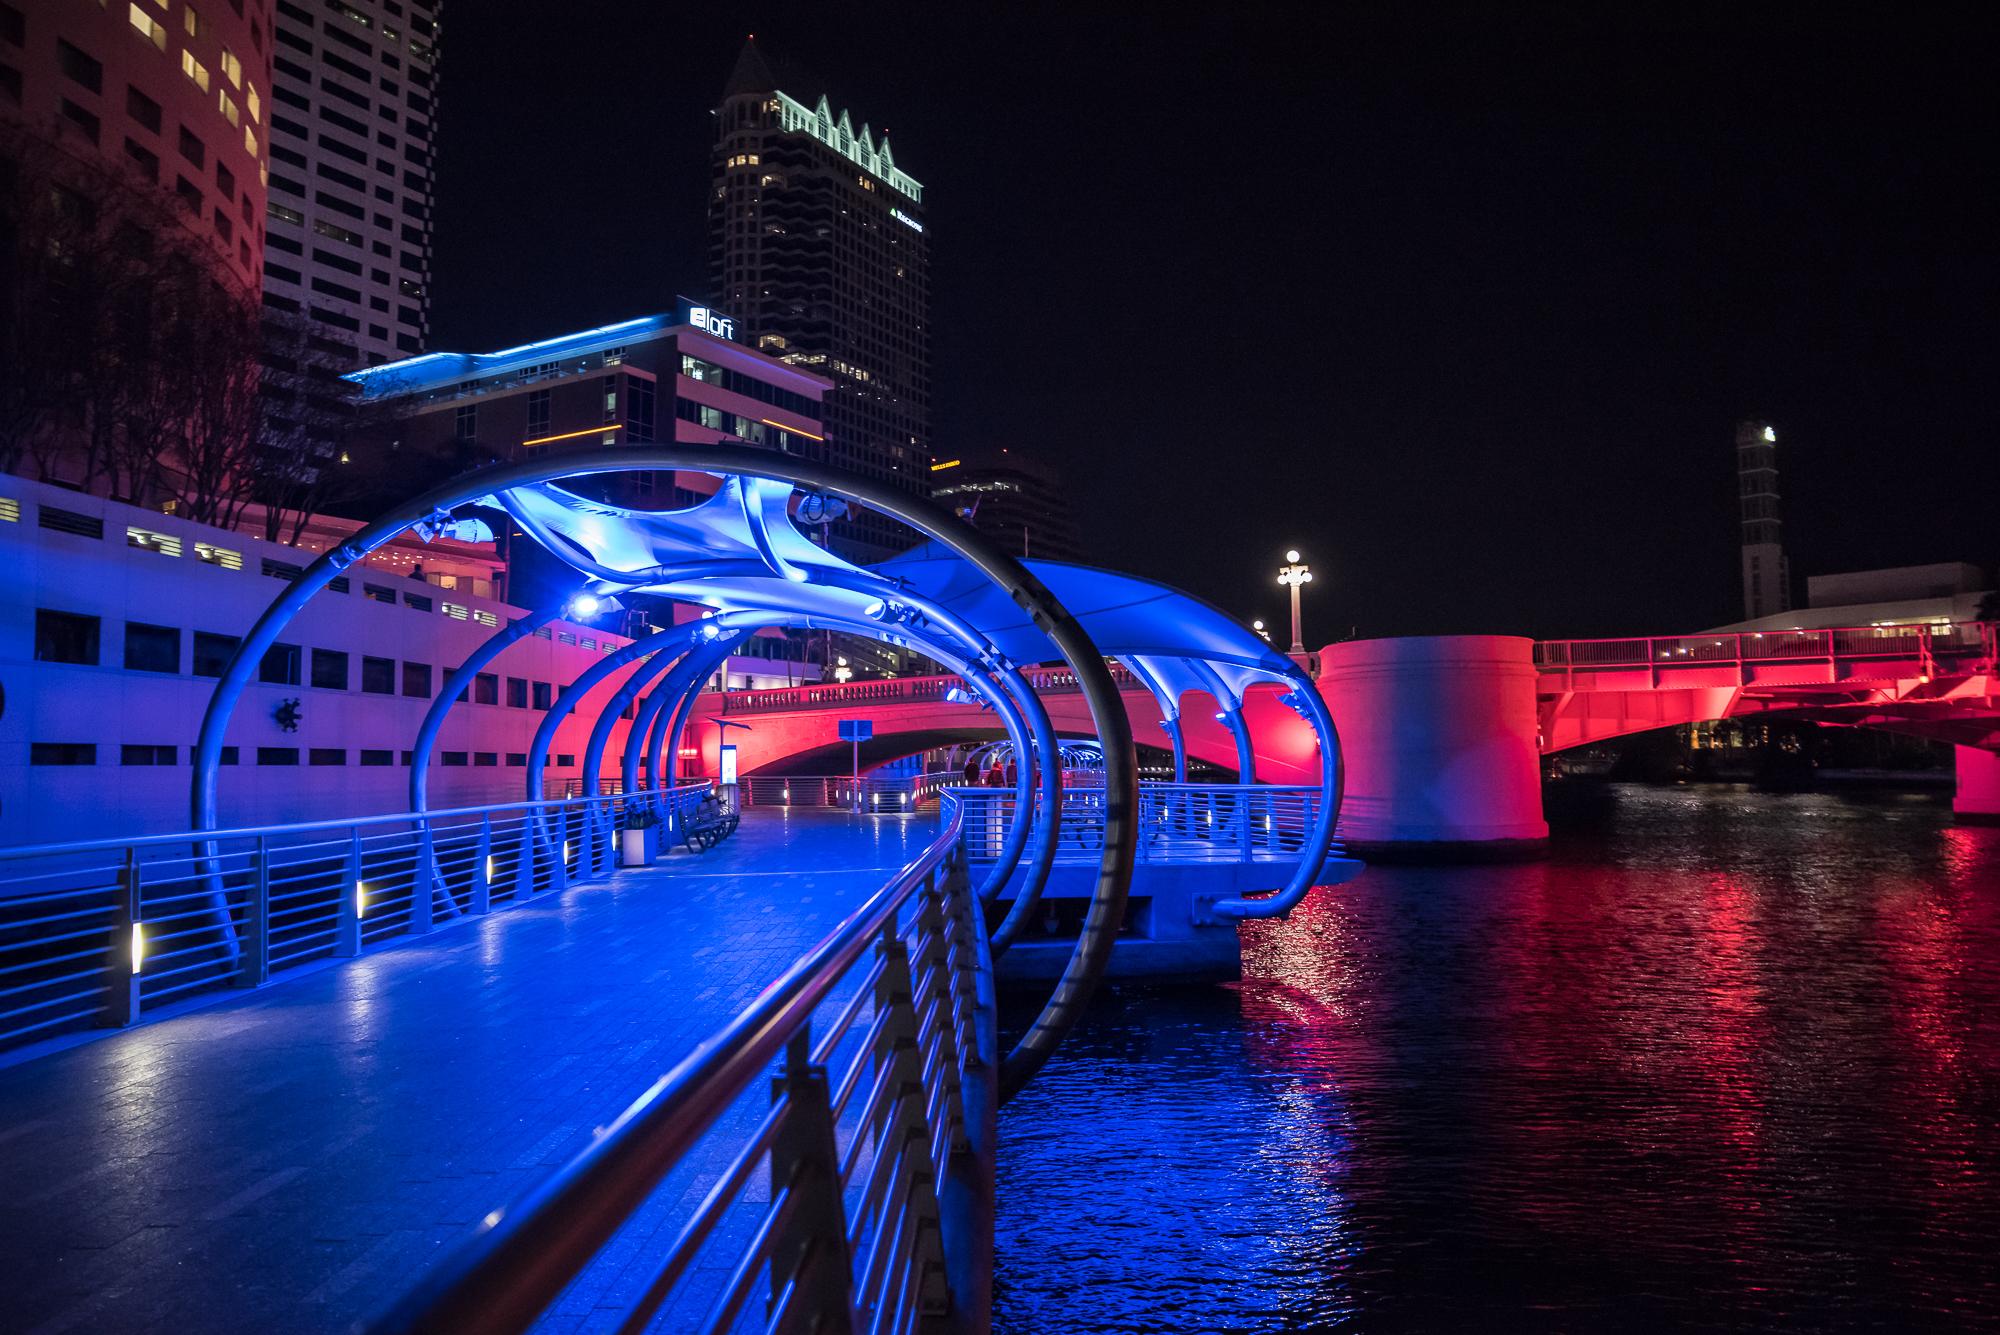 Pretty changing lights on the Riverwalk